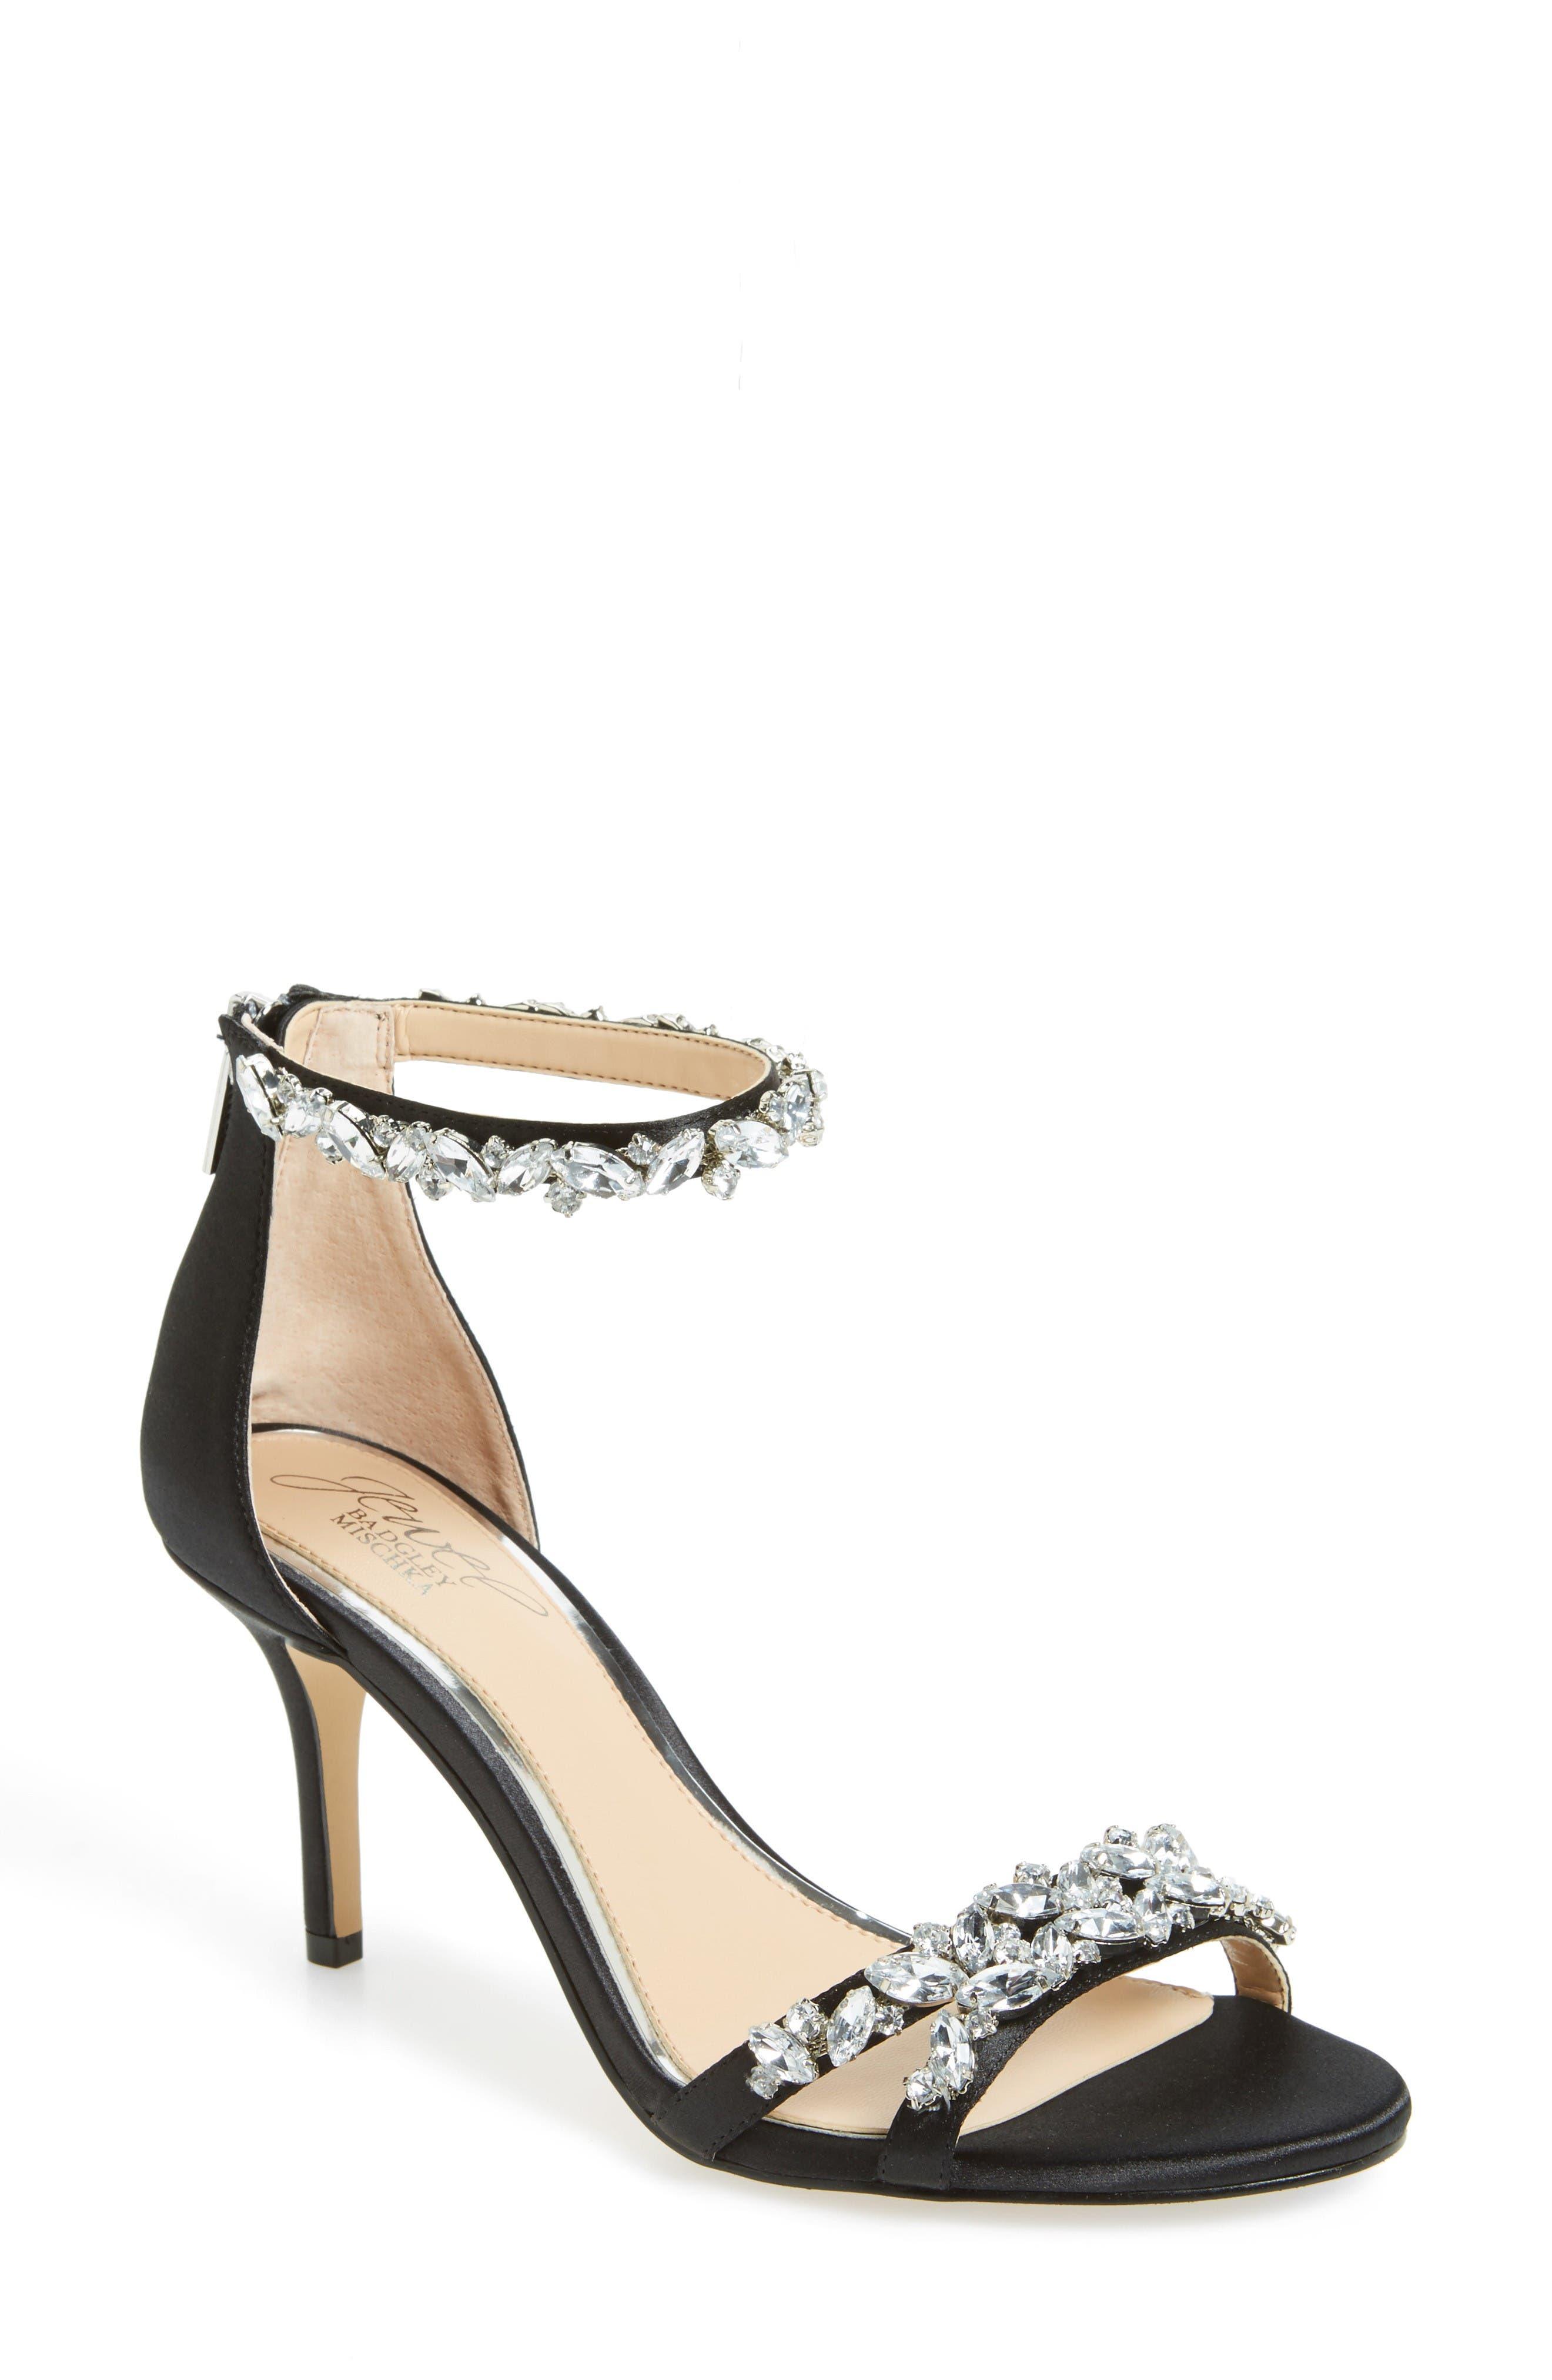 Alternate Image 1 Selected - Jewel Badgley Mischka Caroline Embellished Sandal (Women)